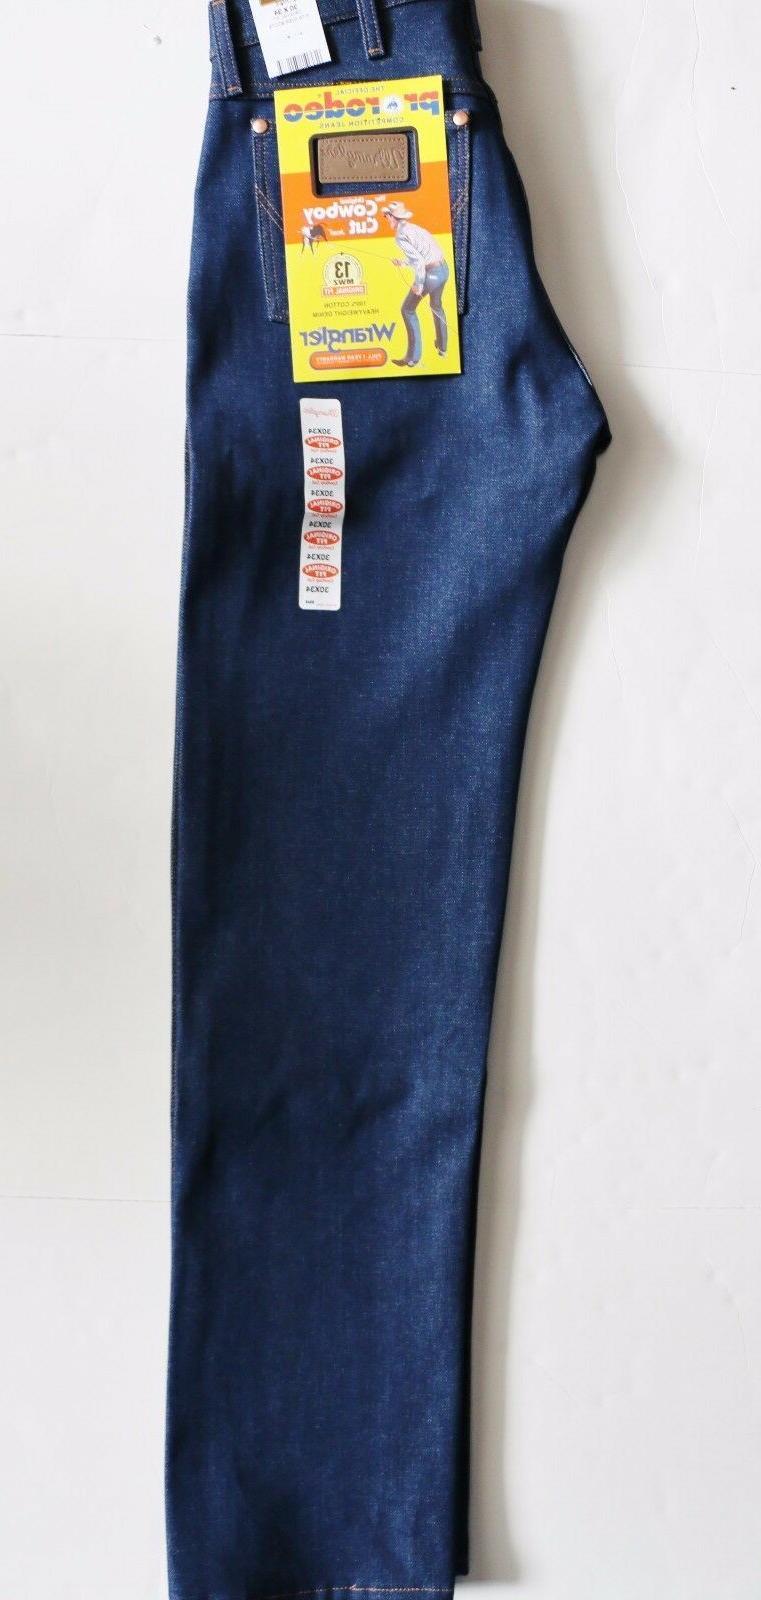 New Cowboy 13MWZ Original Fit Jeans Rigid Sizes